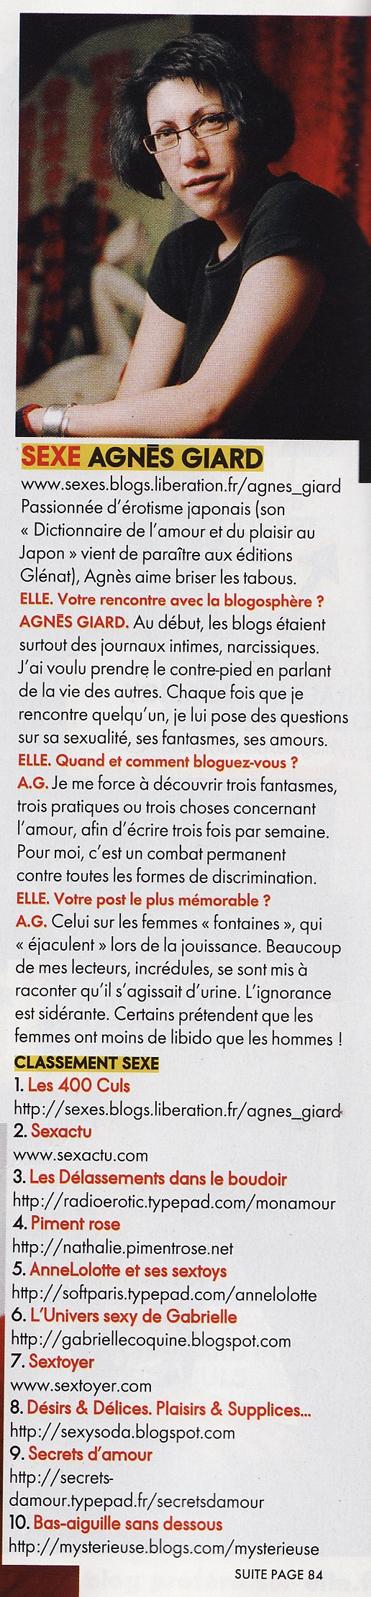 Blog_wikio_elle_sexe